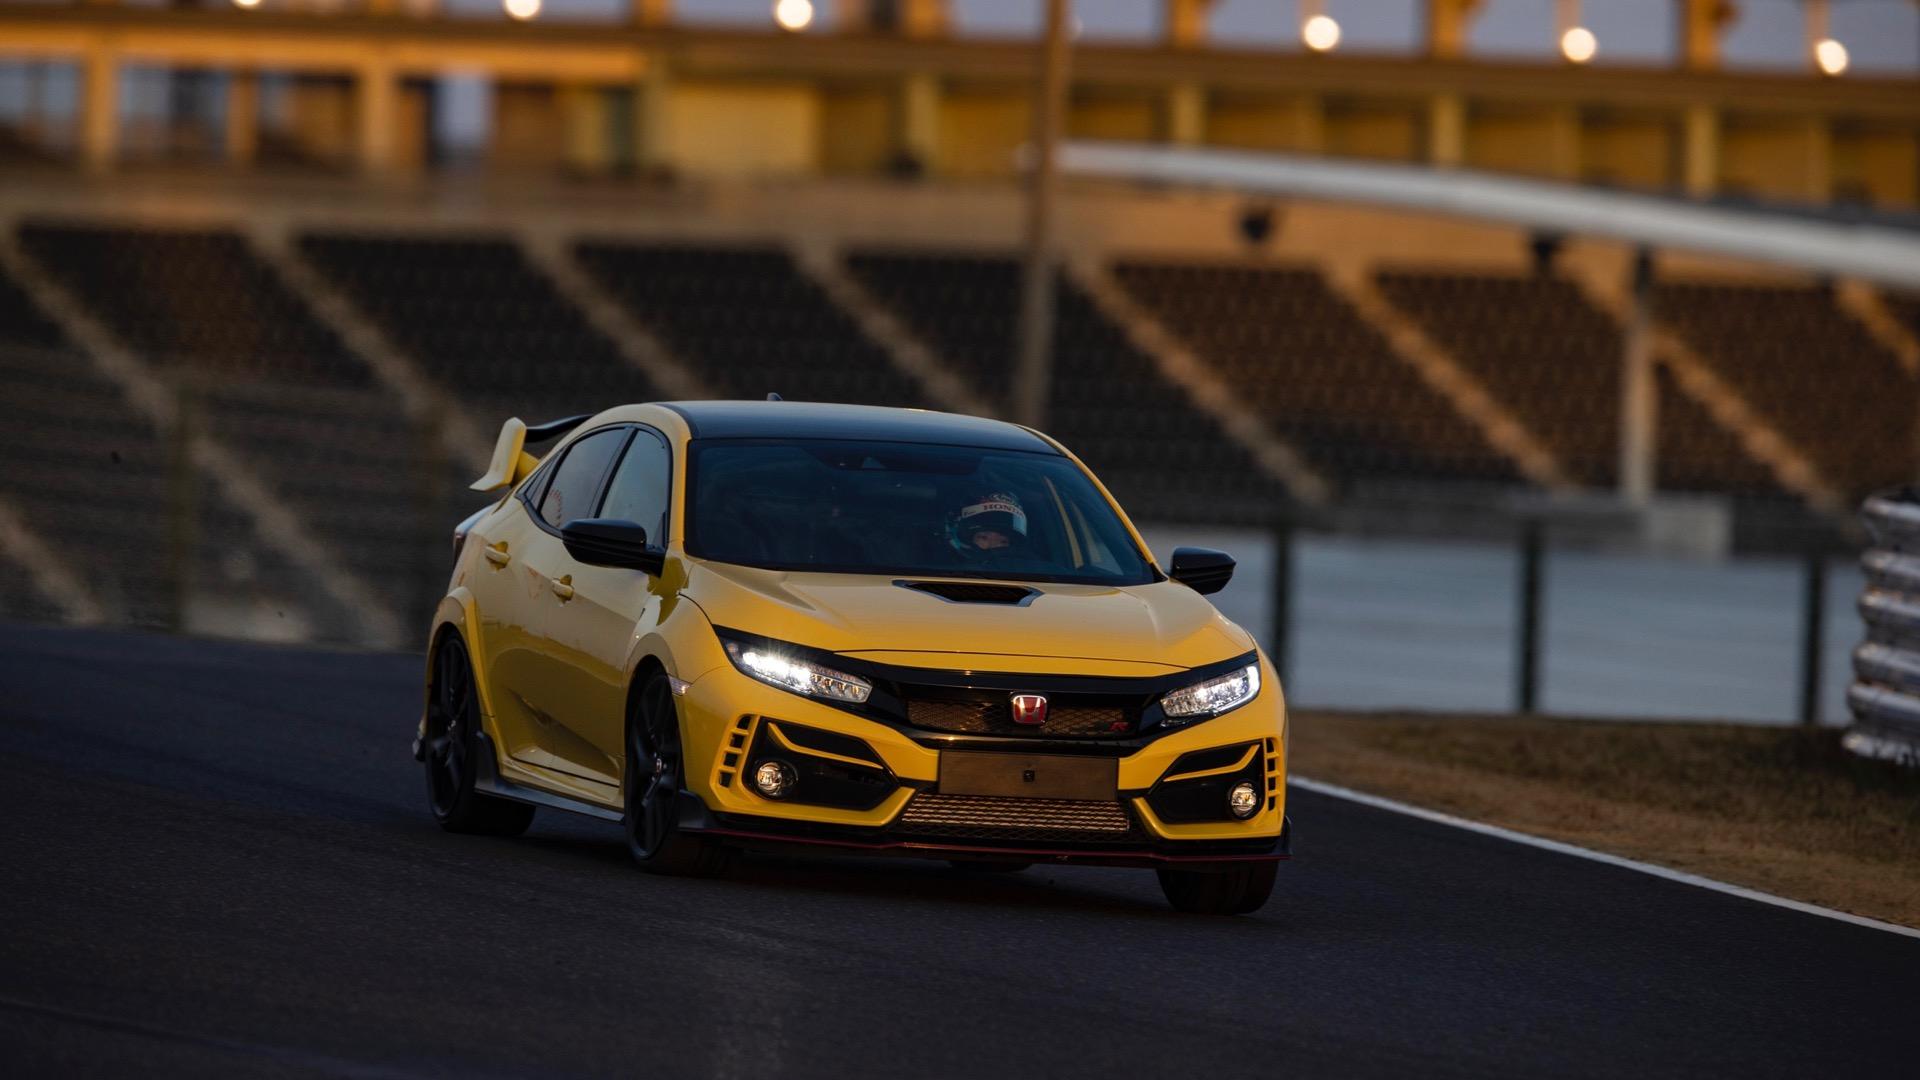 2021 Honda Civic Type R Limited Edition drops weight, sets Suzuka lap record